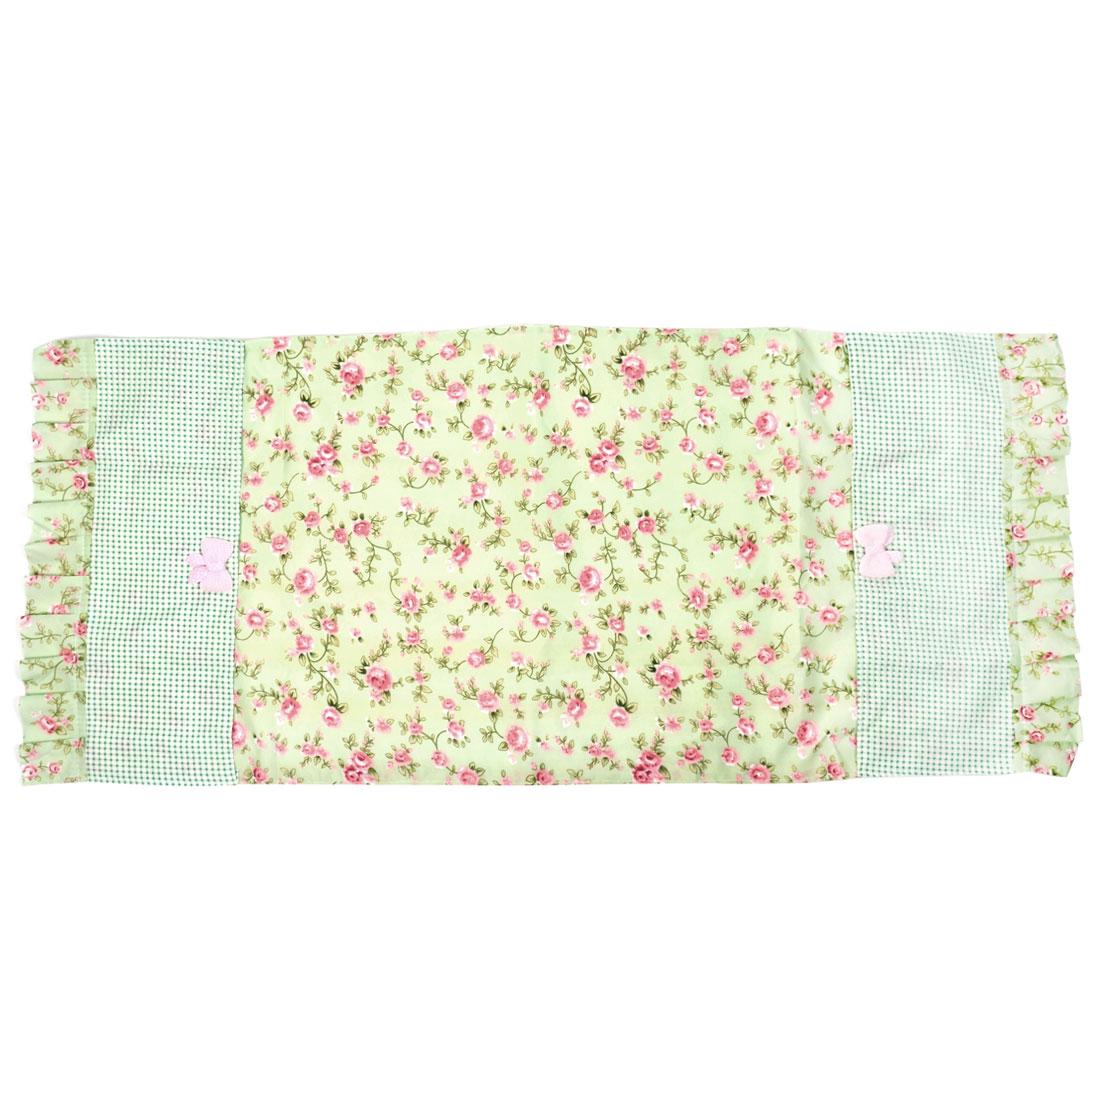 Household Refrigerator Fridge Desktop Fabric Flower Pattern Dustproof Dust Cover